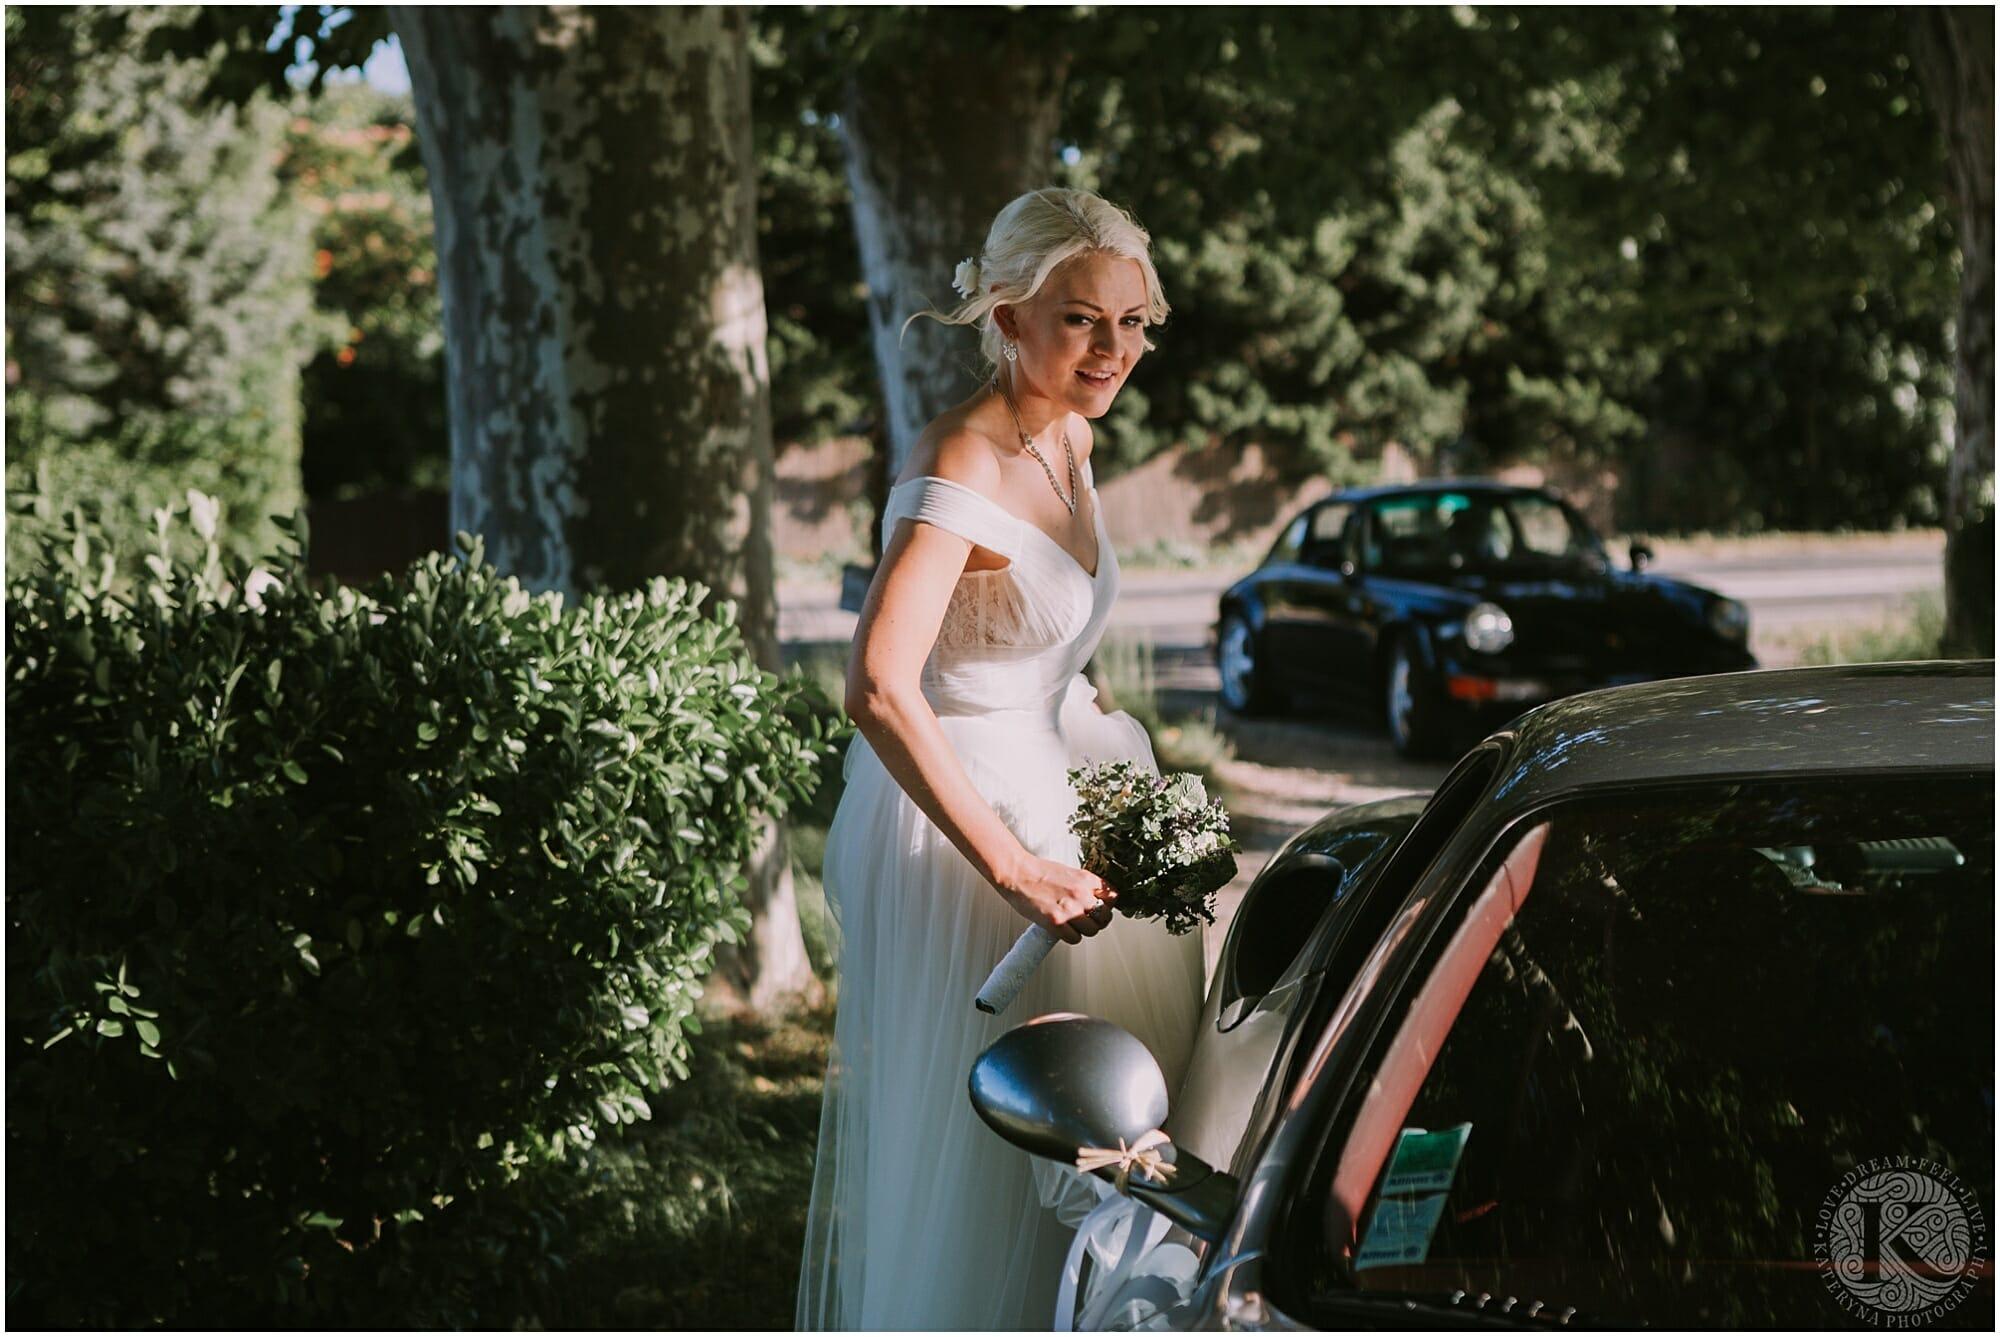 Kateryna-photos-photographe-mariage-chateau-des-3-fontaines-provence-avignon-vaucluse-sud_0094.jpg